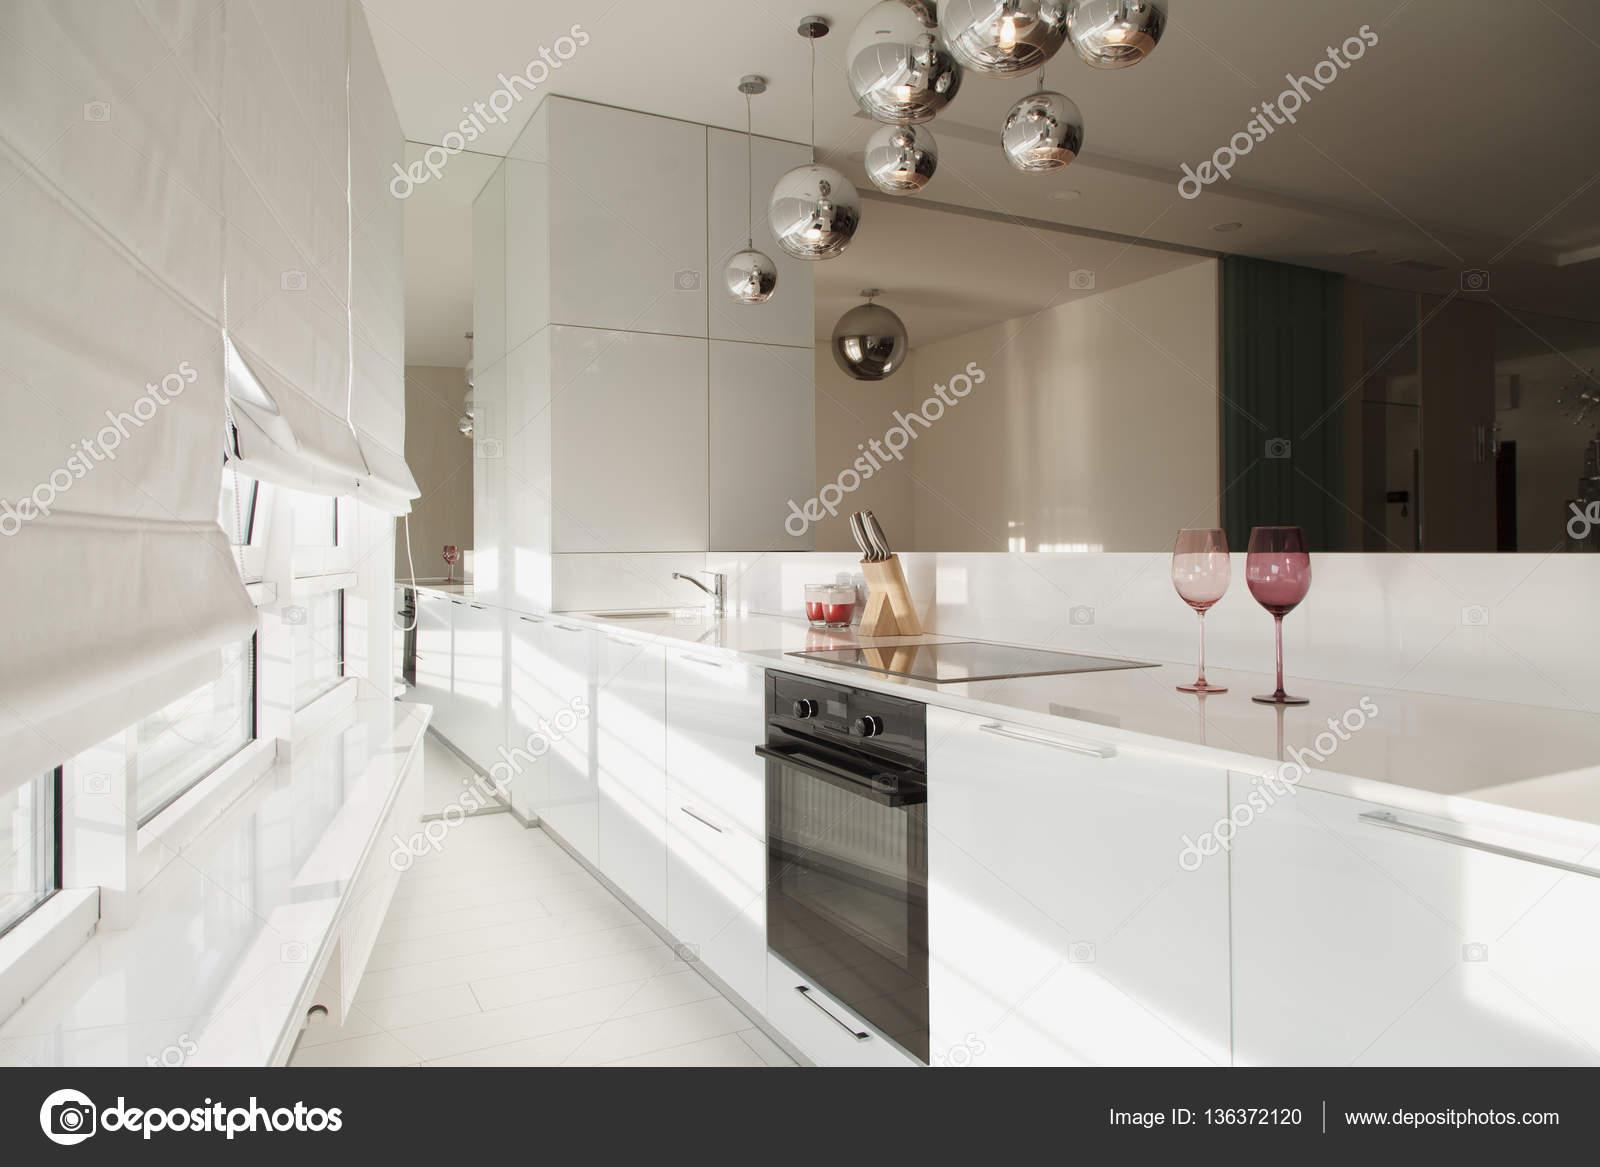 Moderne küchendesign in einem penthouse u stockfoto yuryrumovsky